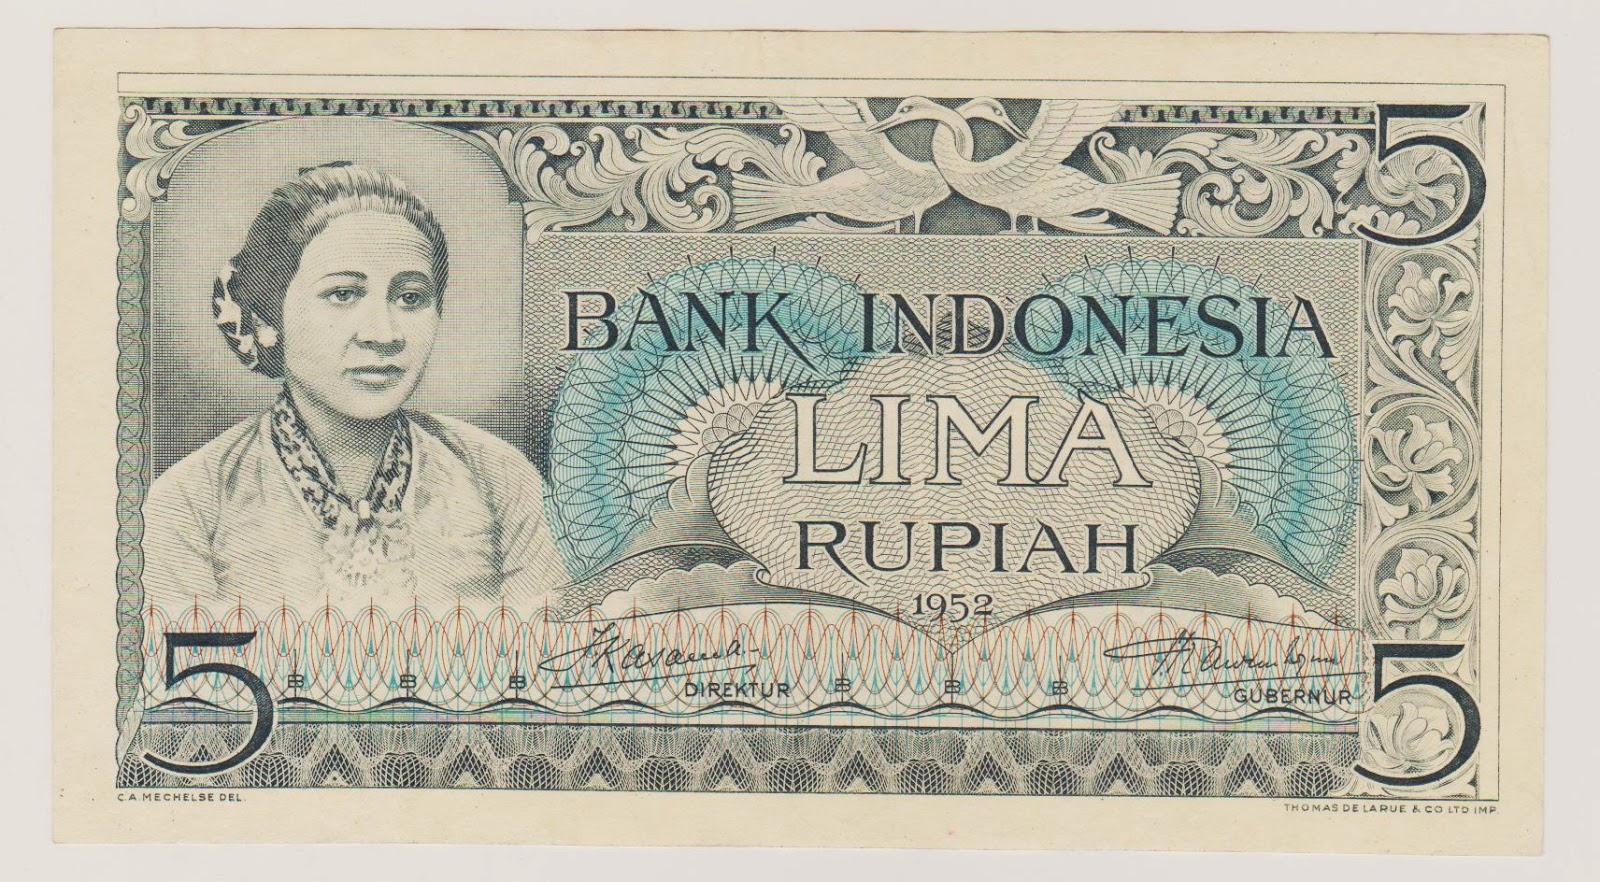 uang kuno seri kebudayaan tahun 1952